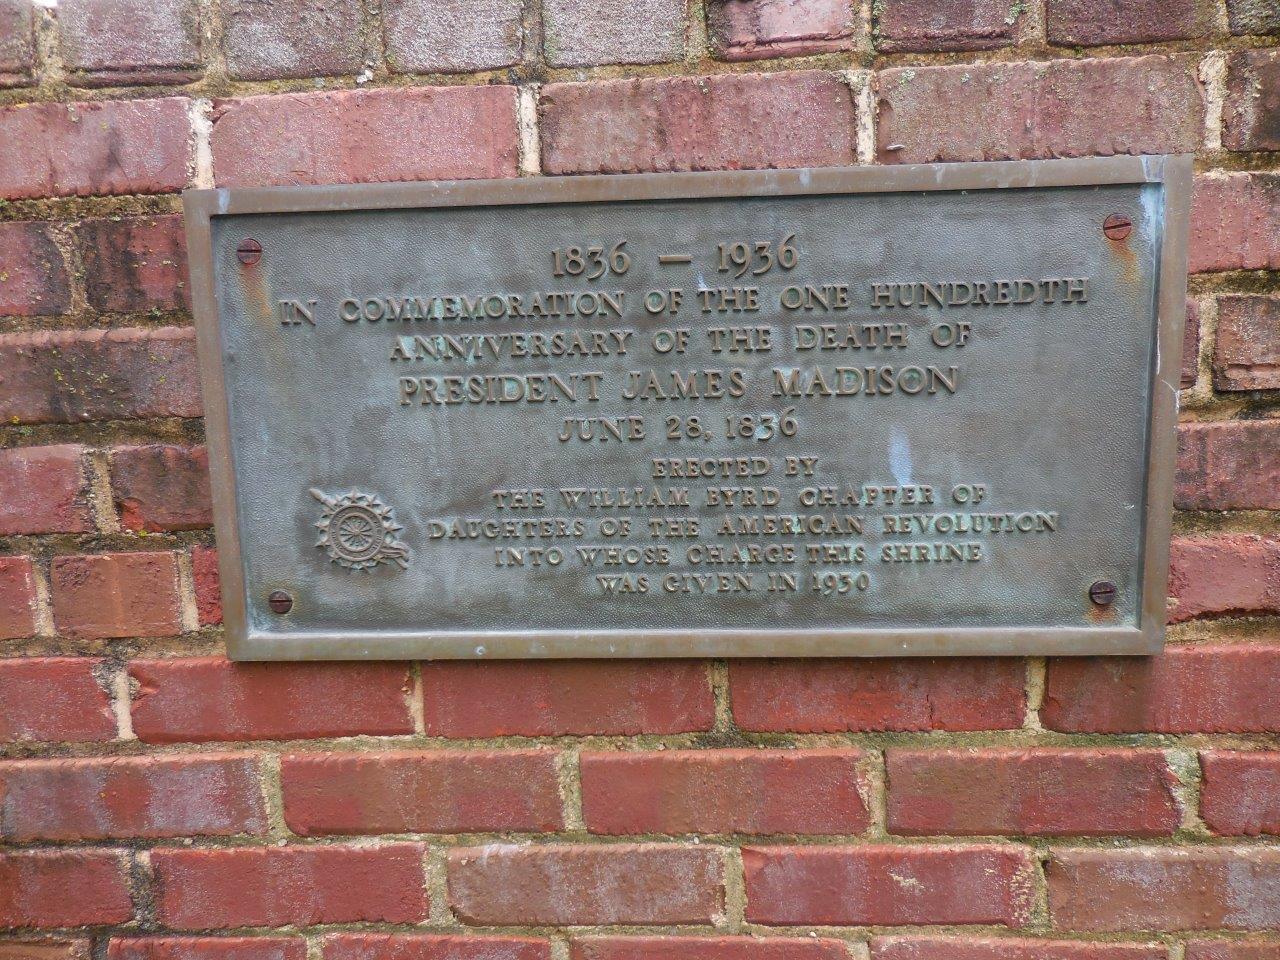 historical marker at James Madison gravesite